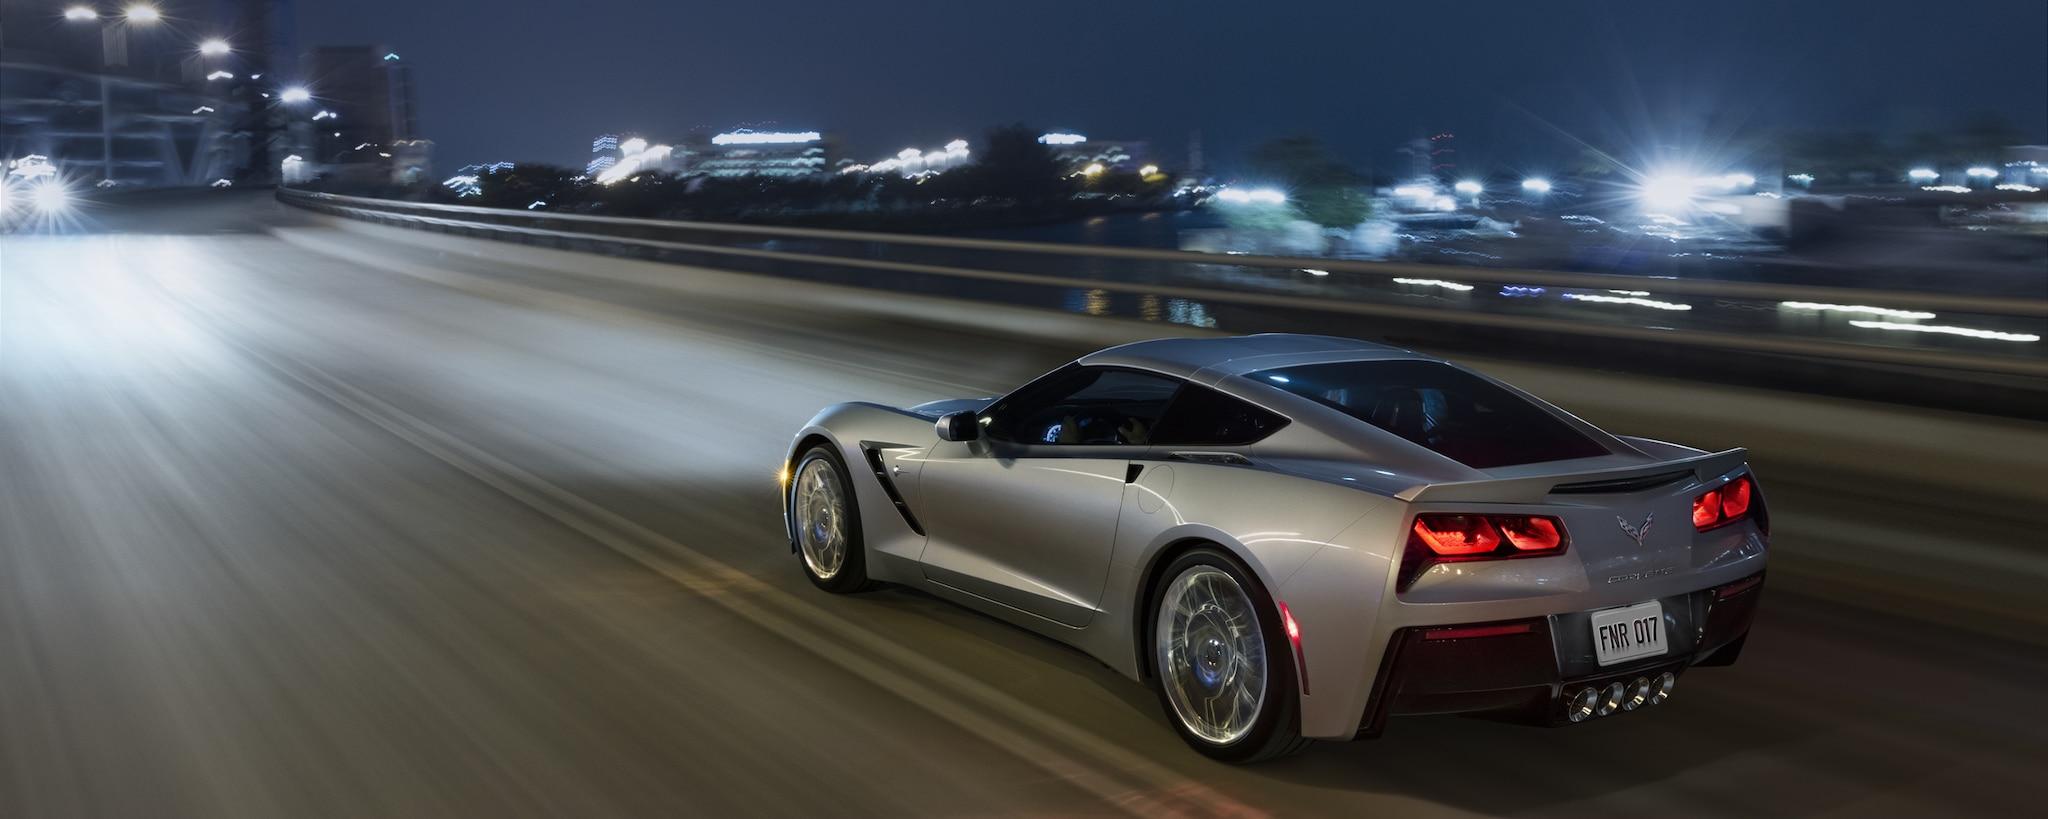 Auto deportivo Corvette Stingray 2019